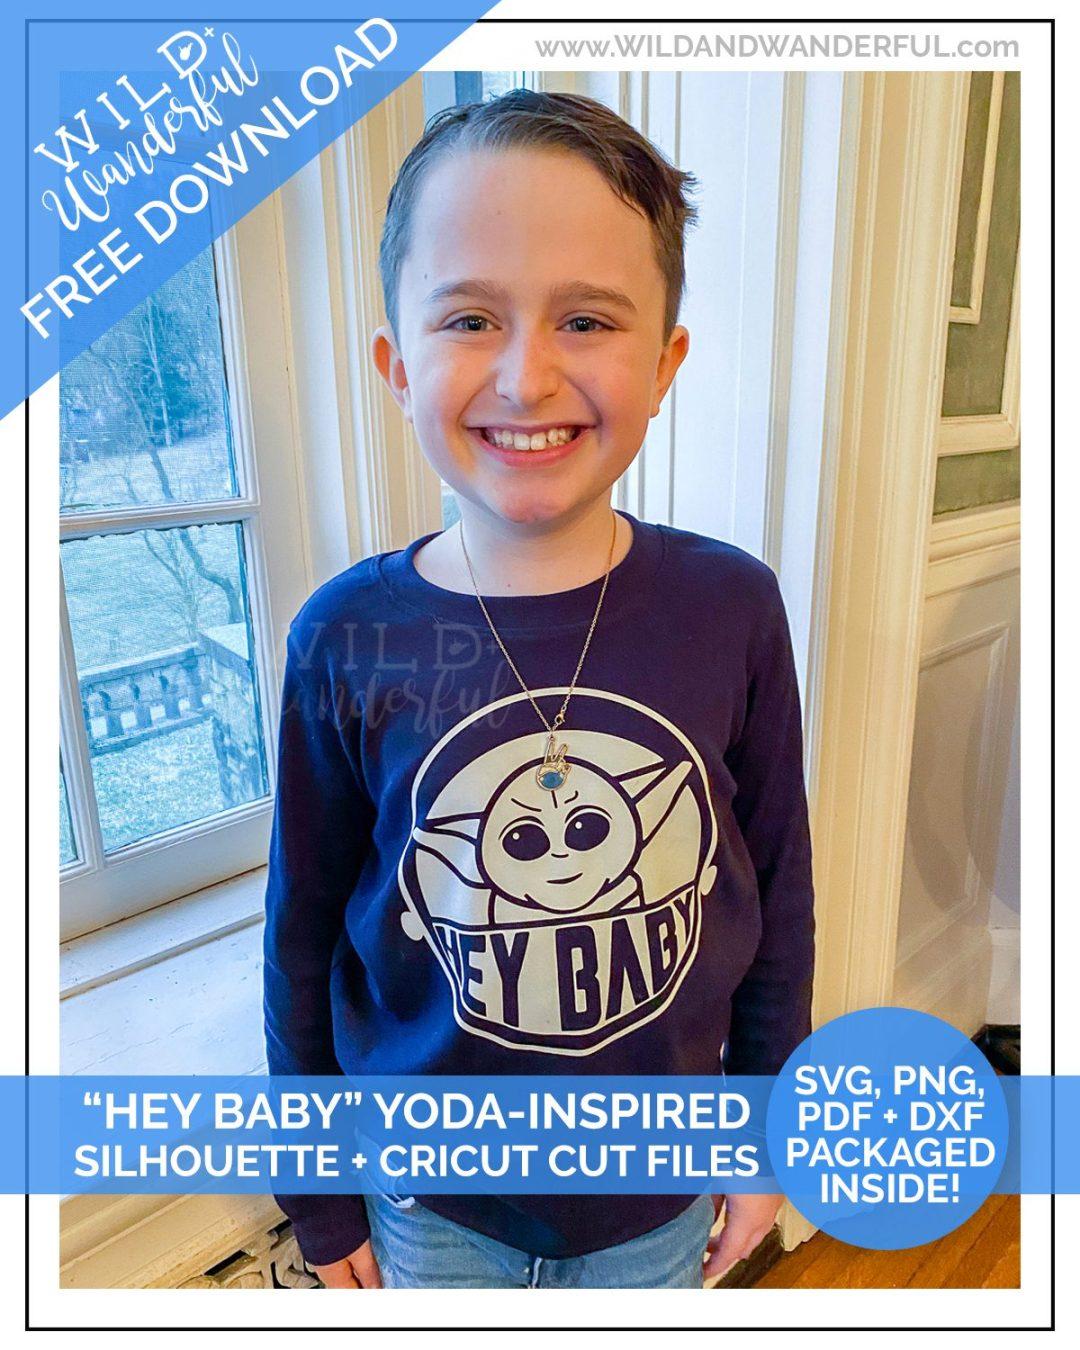 """Hey Baby"" Yoda-Inspired Design :: FREE Silhouette + Cricut Cut Files!"